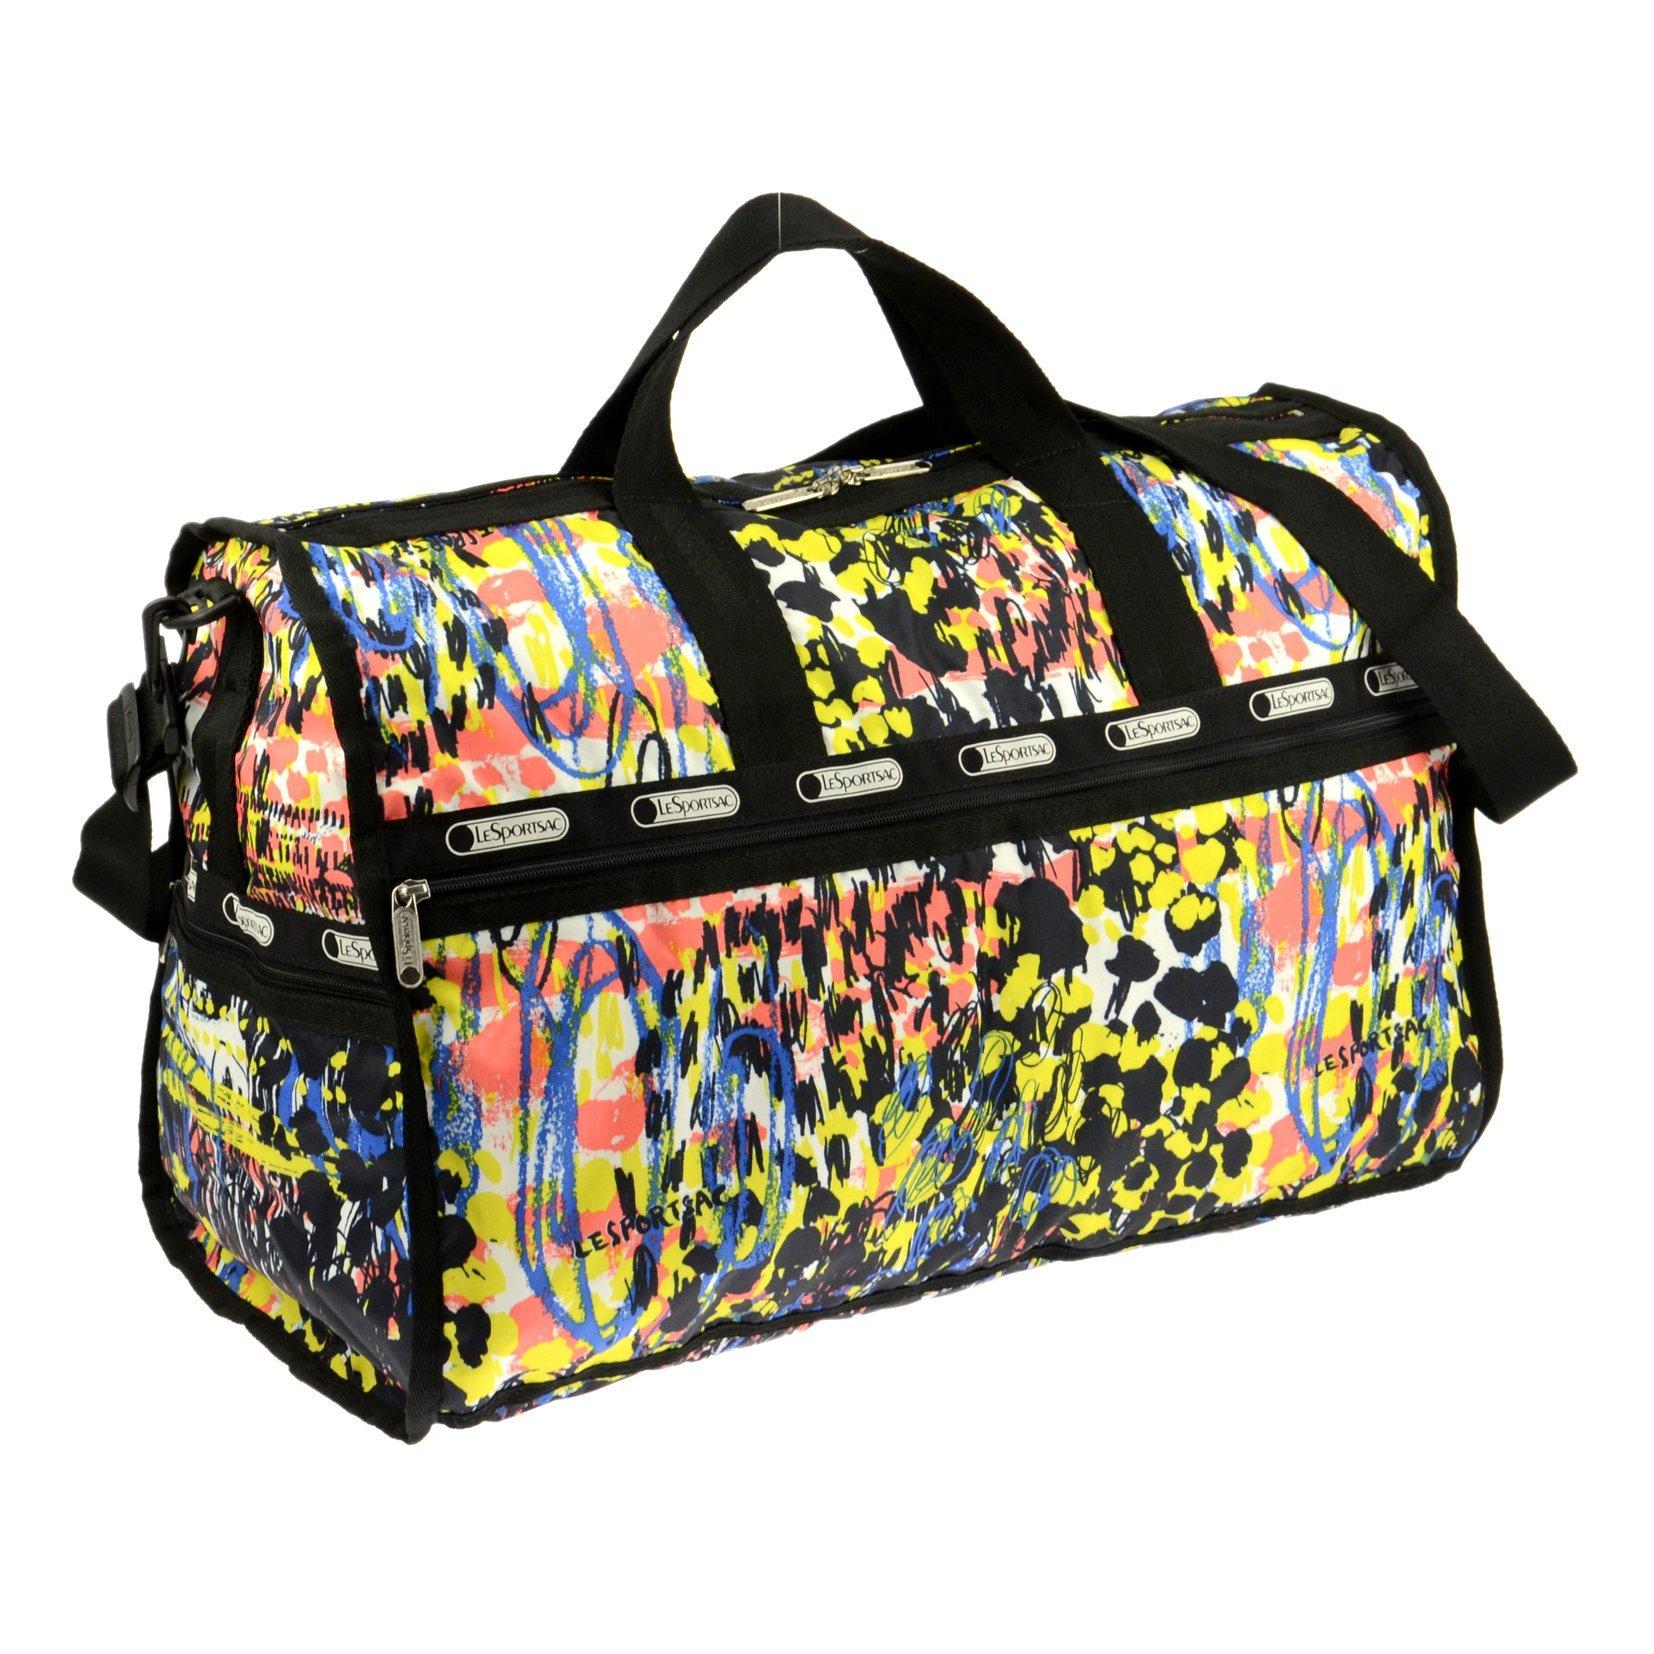 LeSportsac Large Weekender Bag, Blooming, One Size